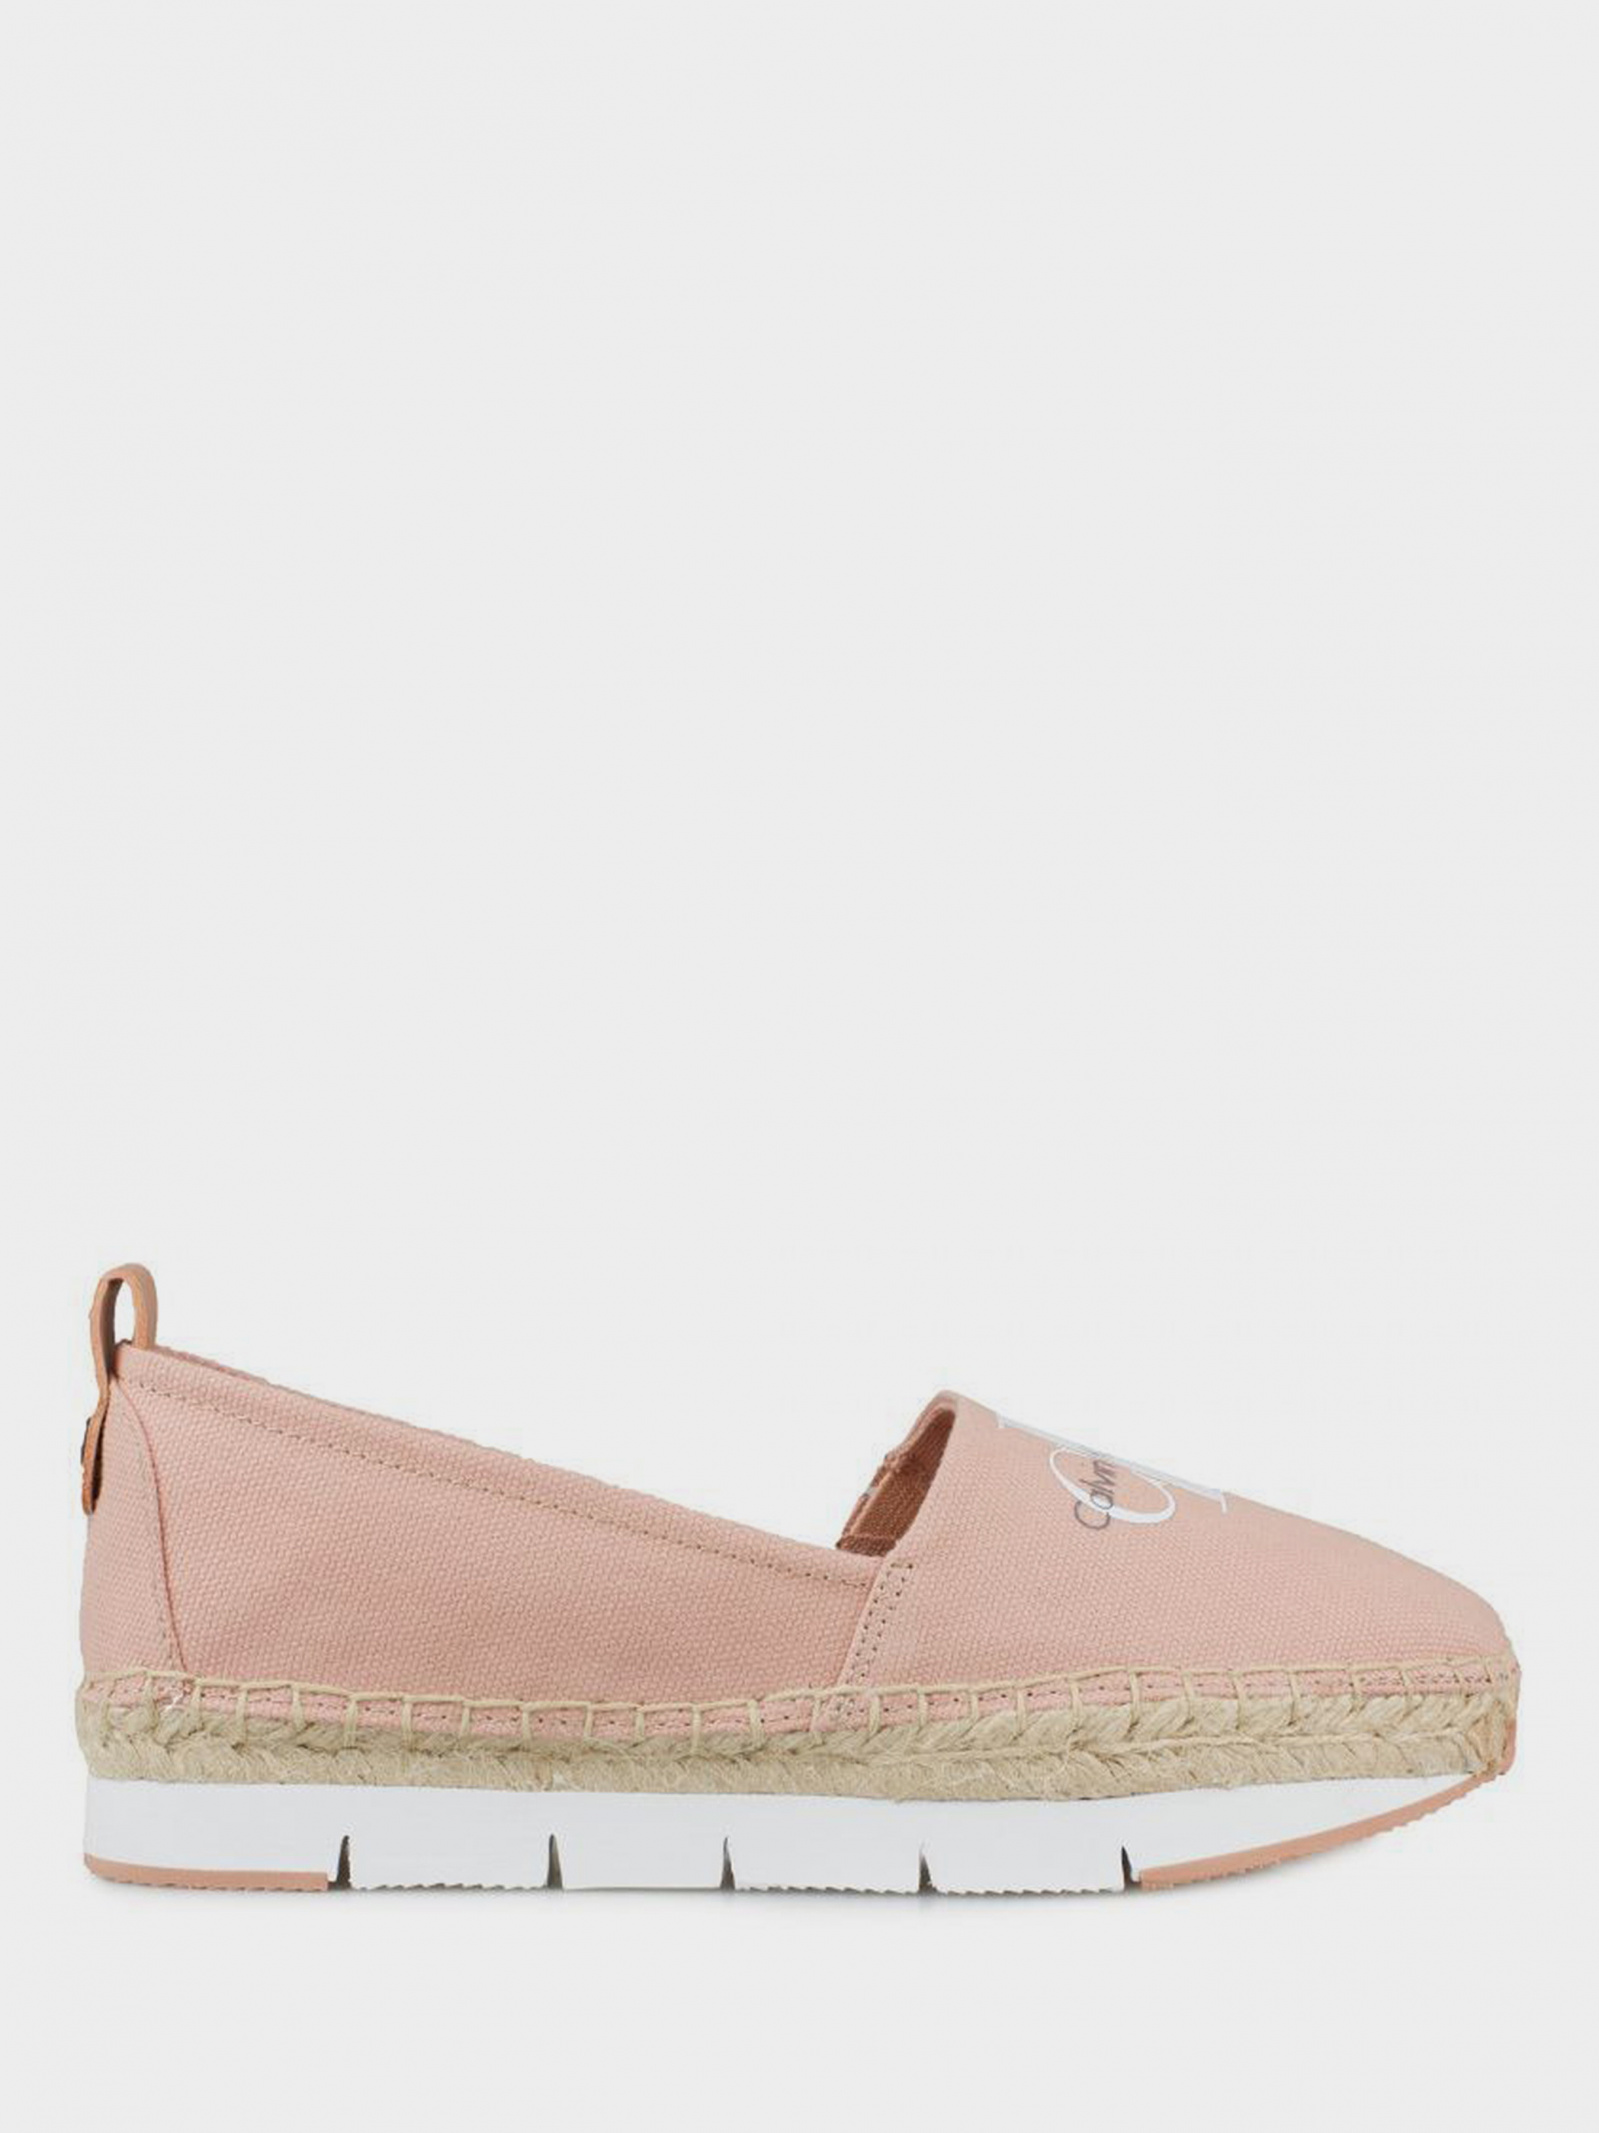 Слипоны для женщин Calvin Klein Jeans GENNA CANVAS R3768/DSK цена, 2017